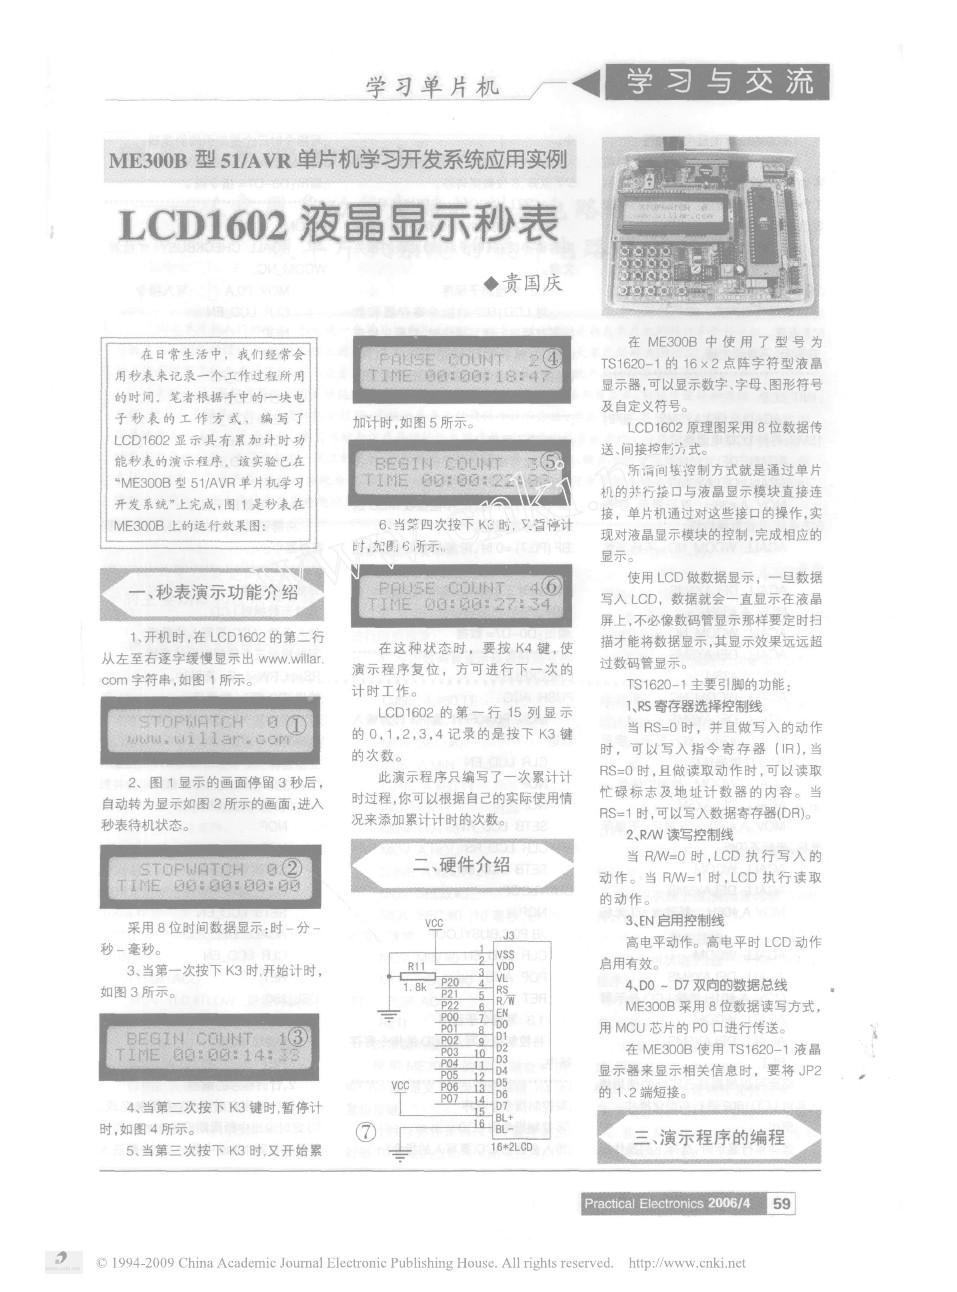 avr单片机 电子元器件图片 液晶1602 电子秒表课程设计报告 lcd1602中图片